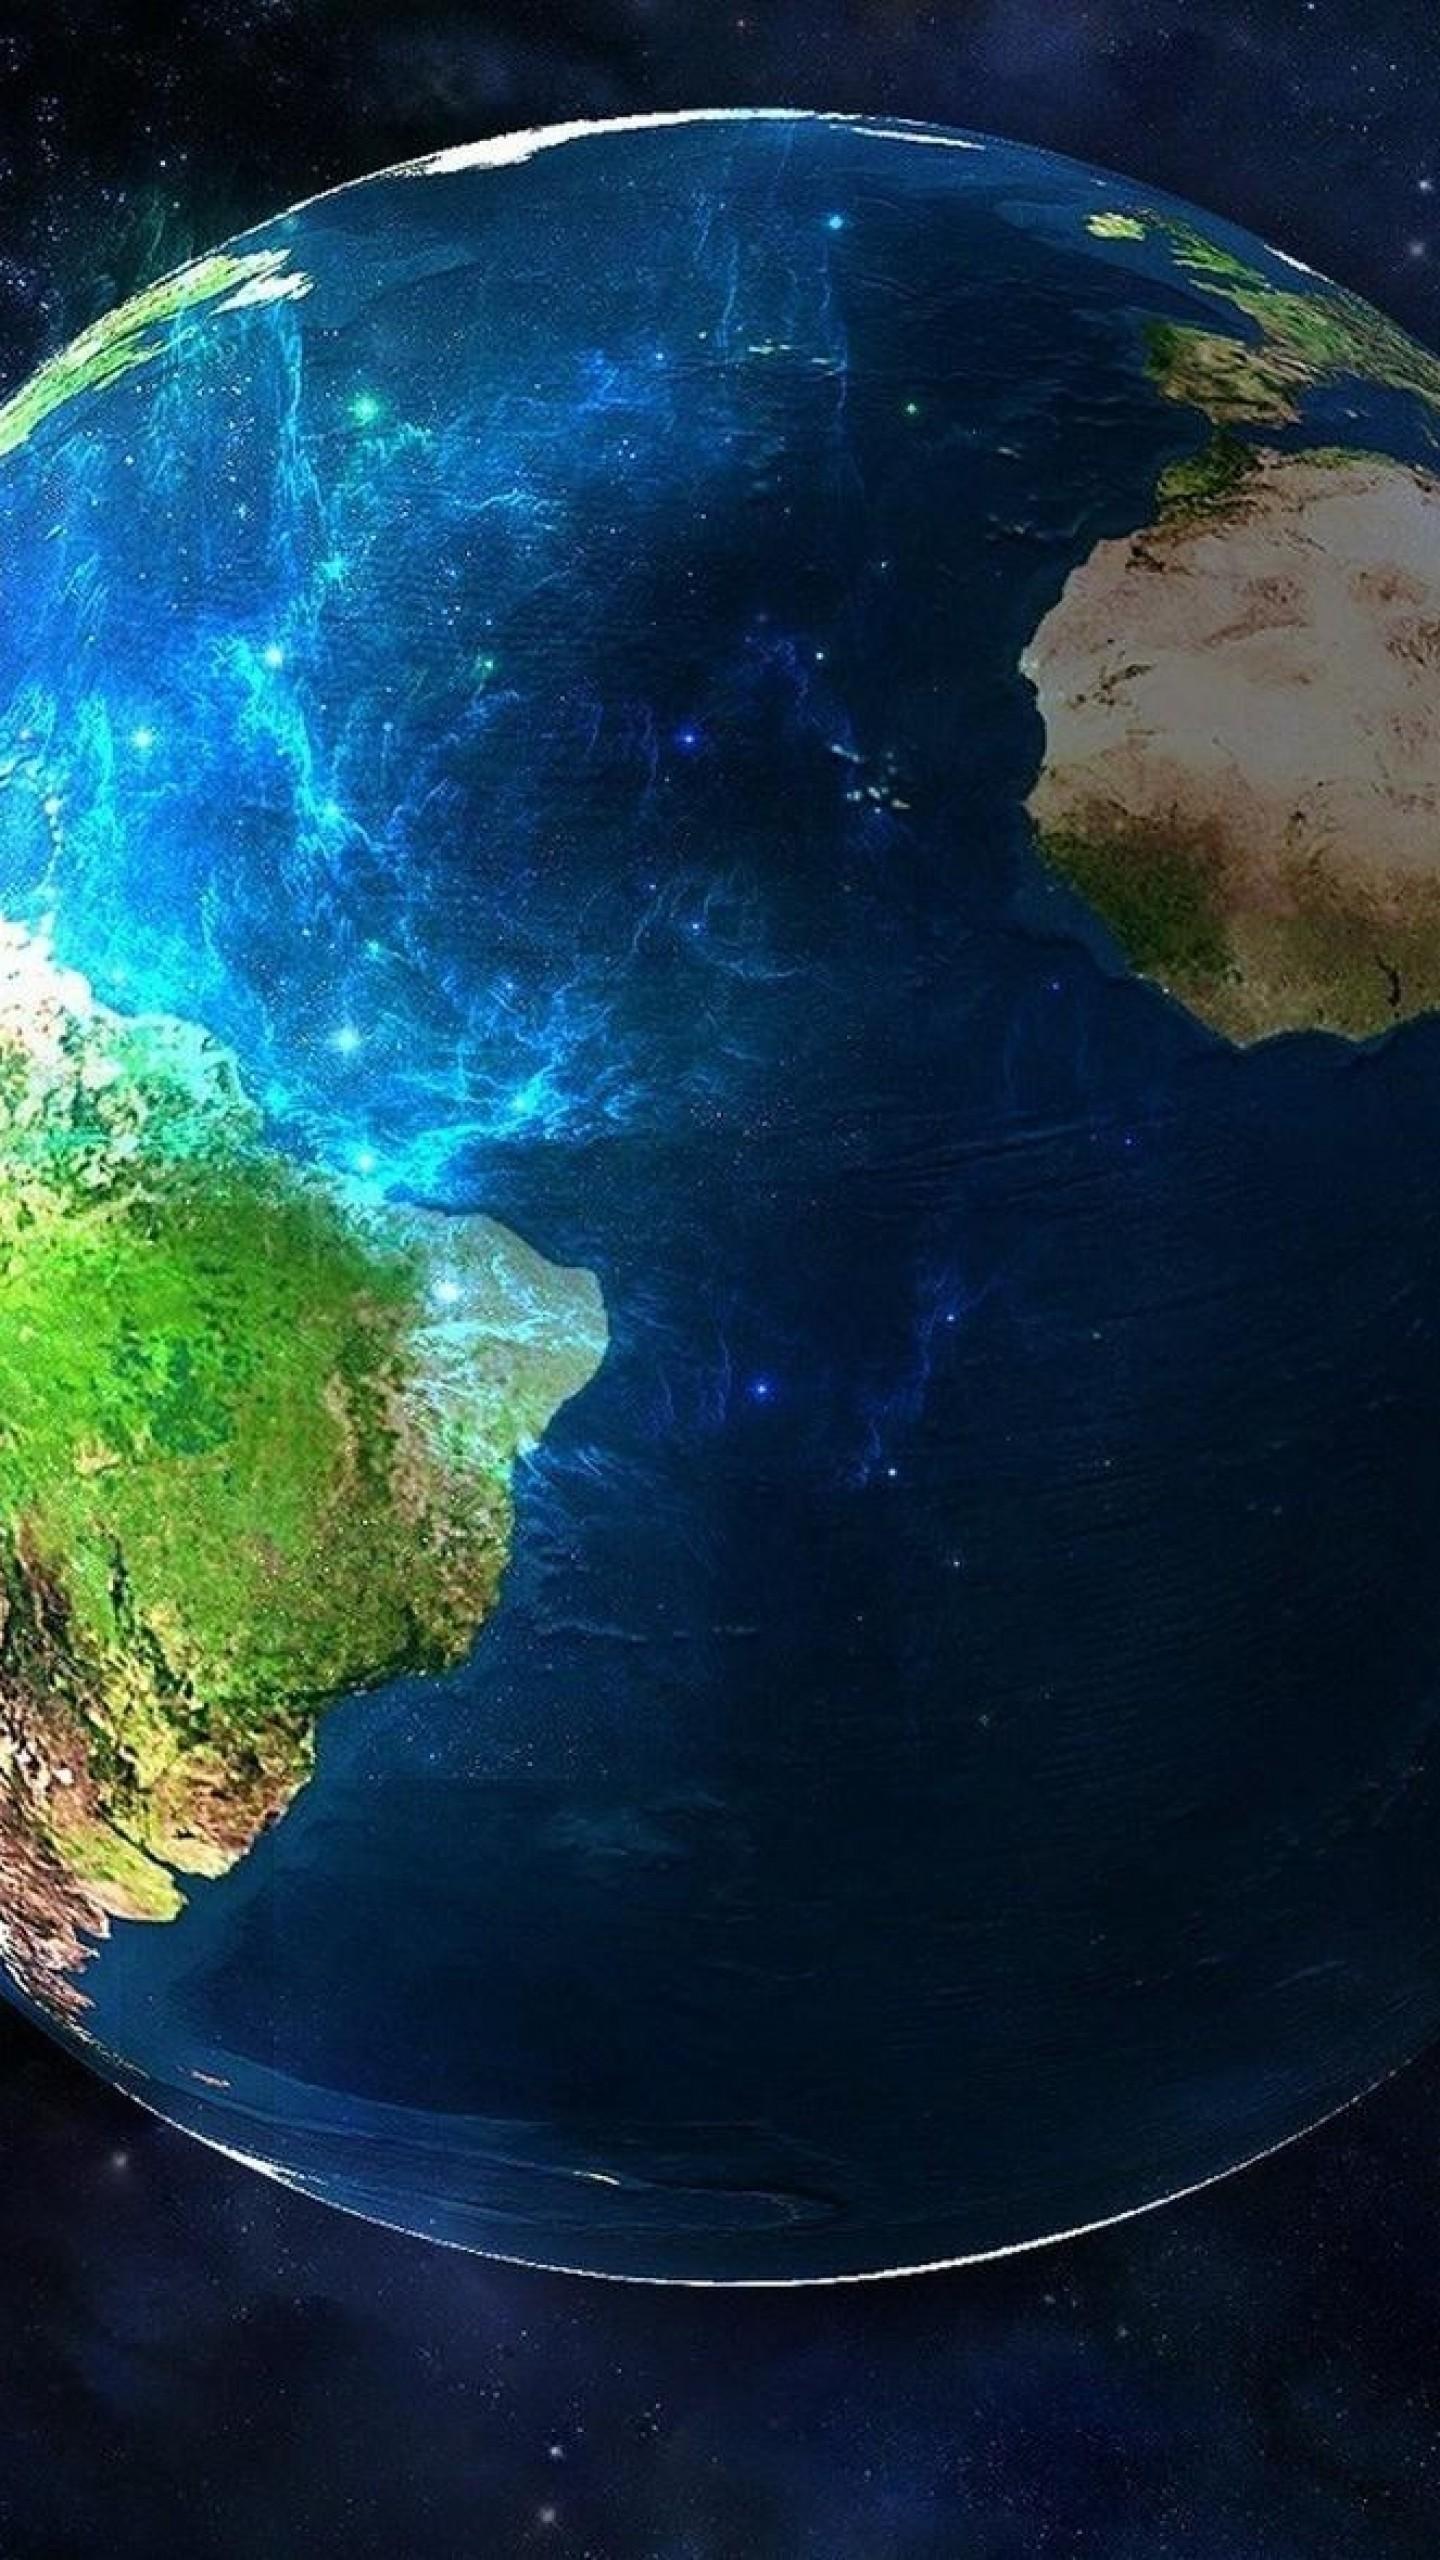 Wallpaper earth, planet, space, nebula